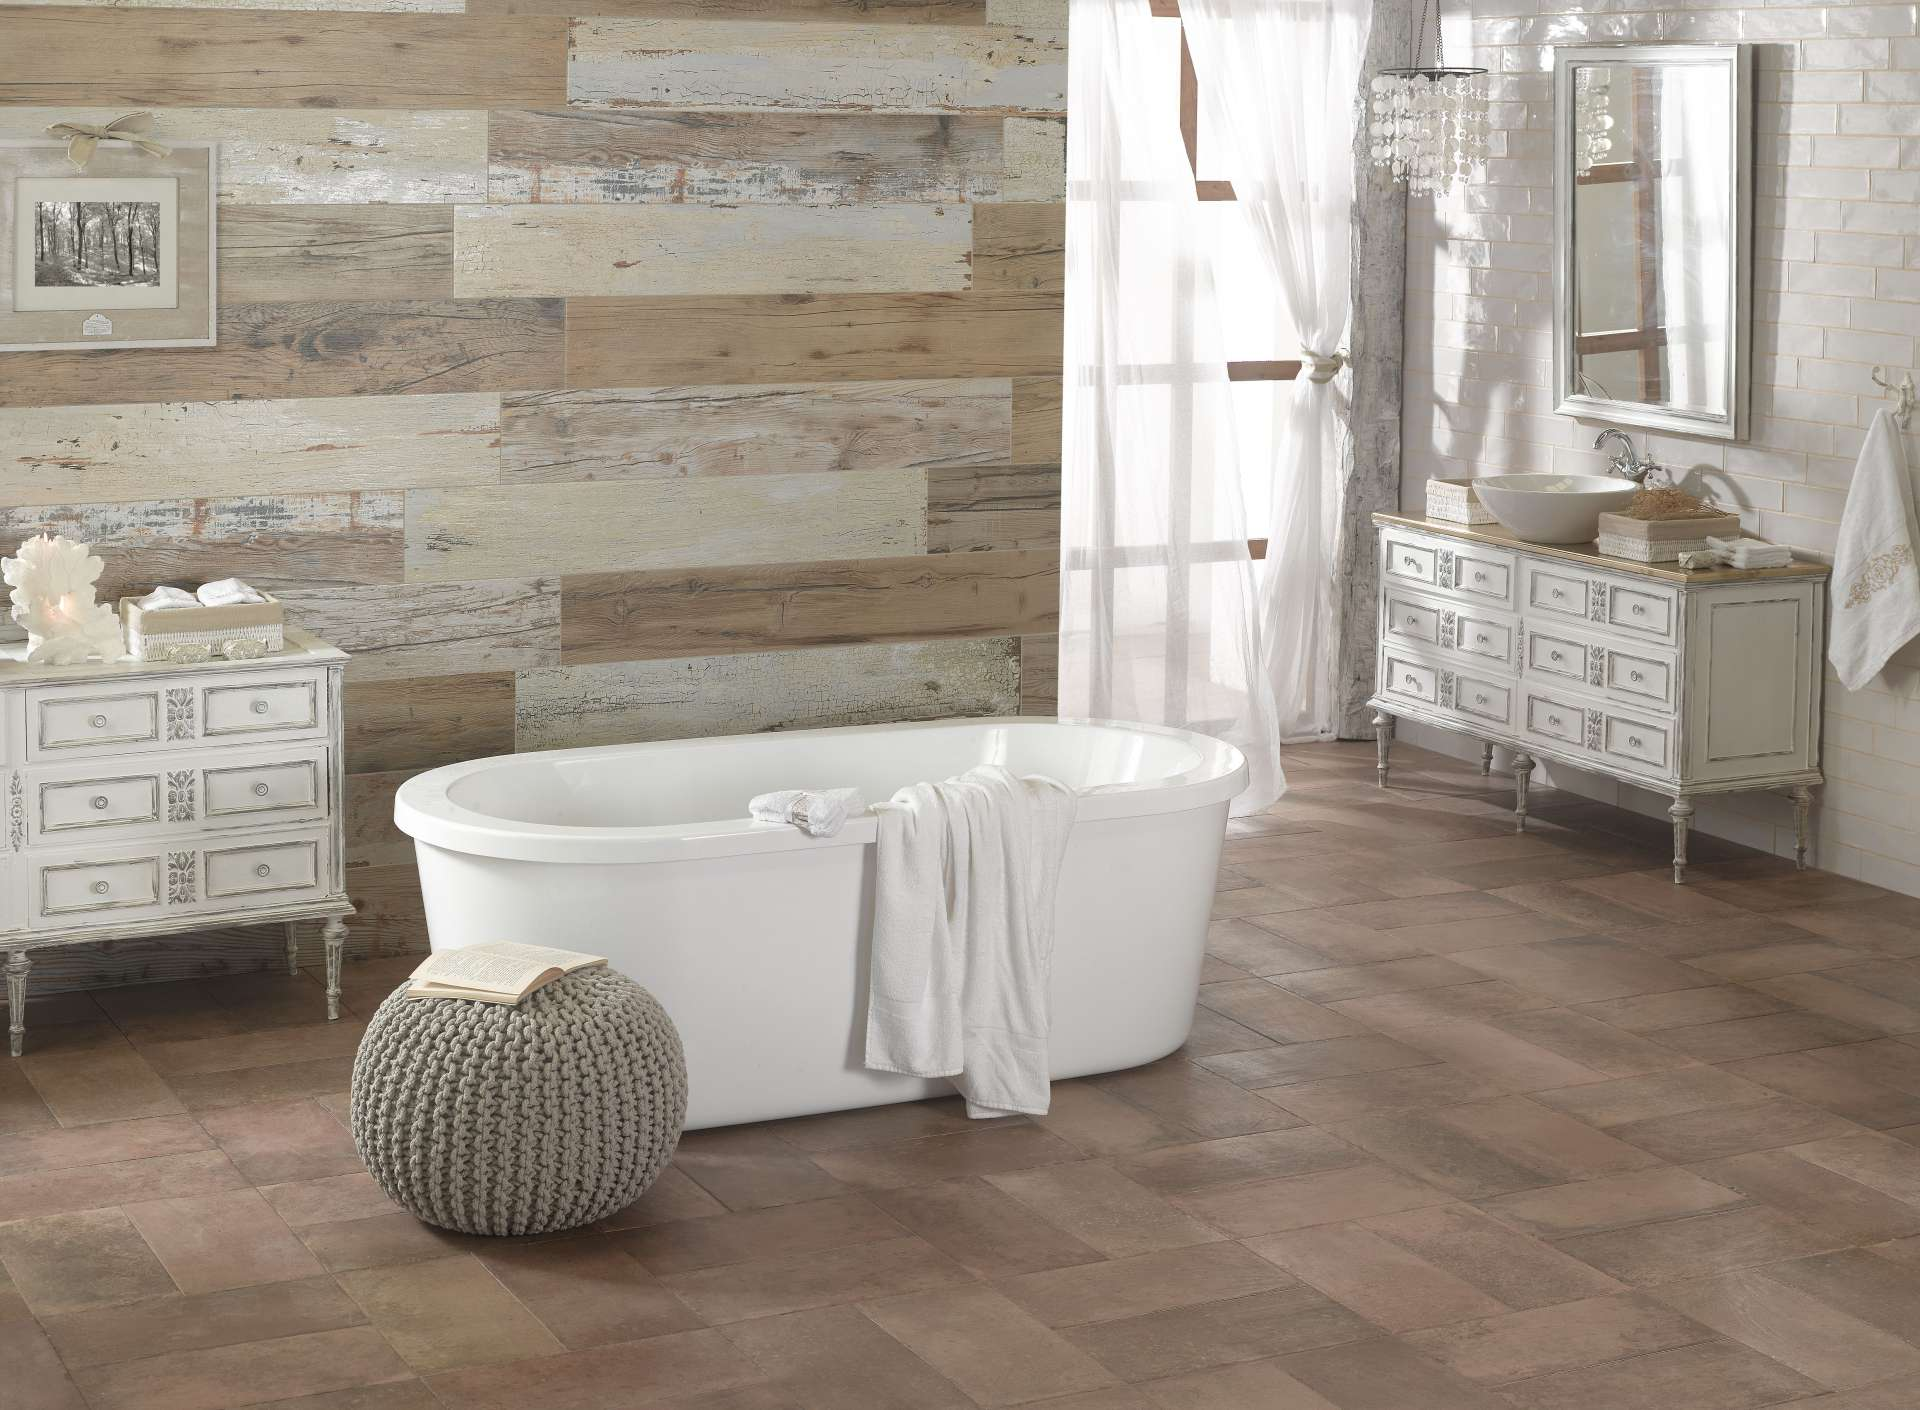 ban%cc%83o-interiores-vintage-yuncos-yuncler-illescas-toledo-porcelanico-madera